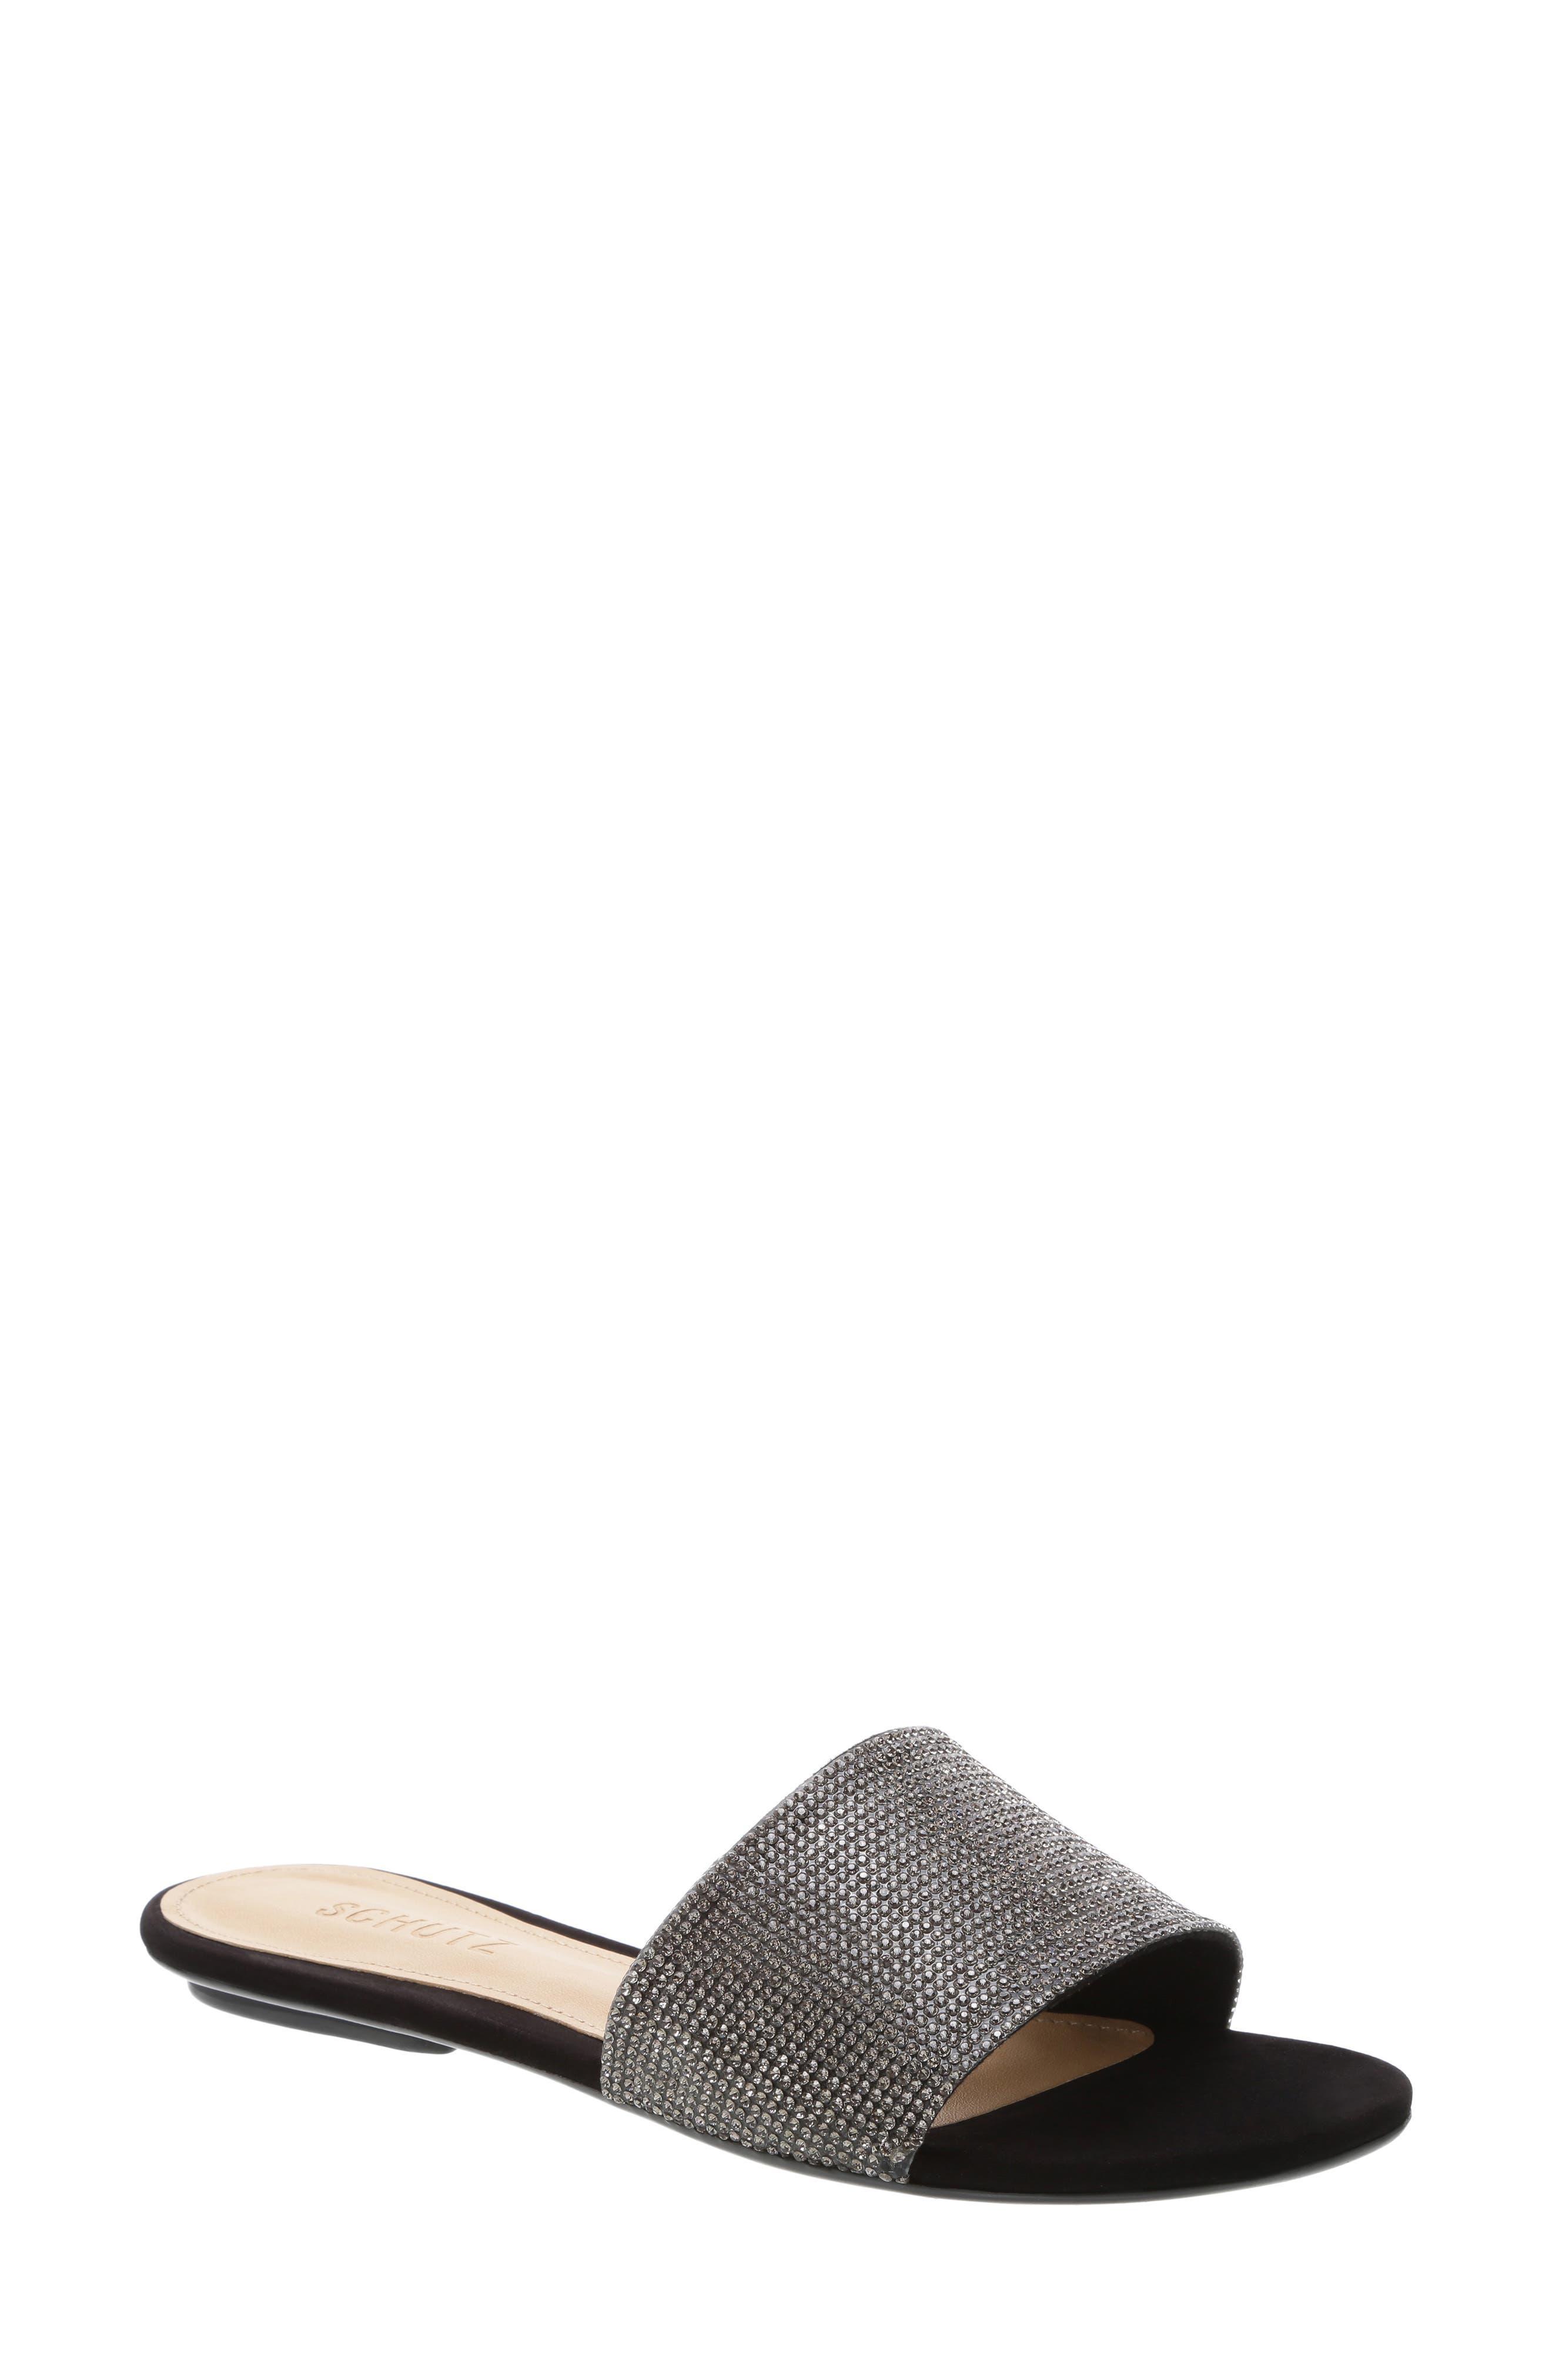 SCHUTZ Queren Embellished Slide Sandal, Main, color, BLACK/ BLACK DIAMOND FABRIC